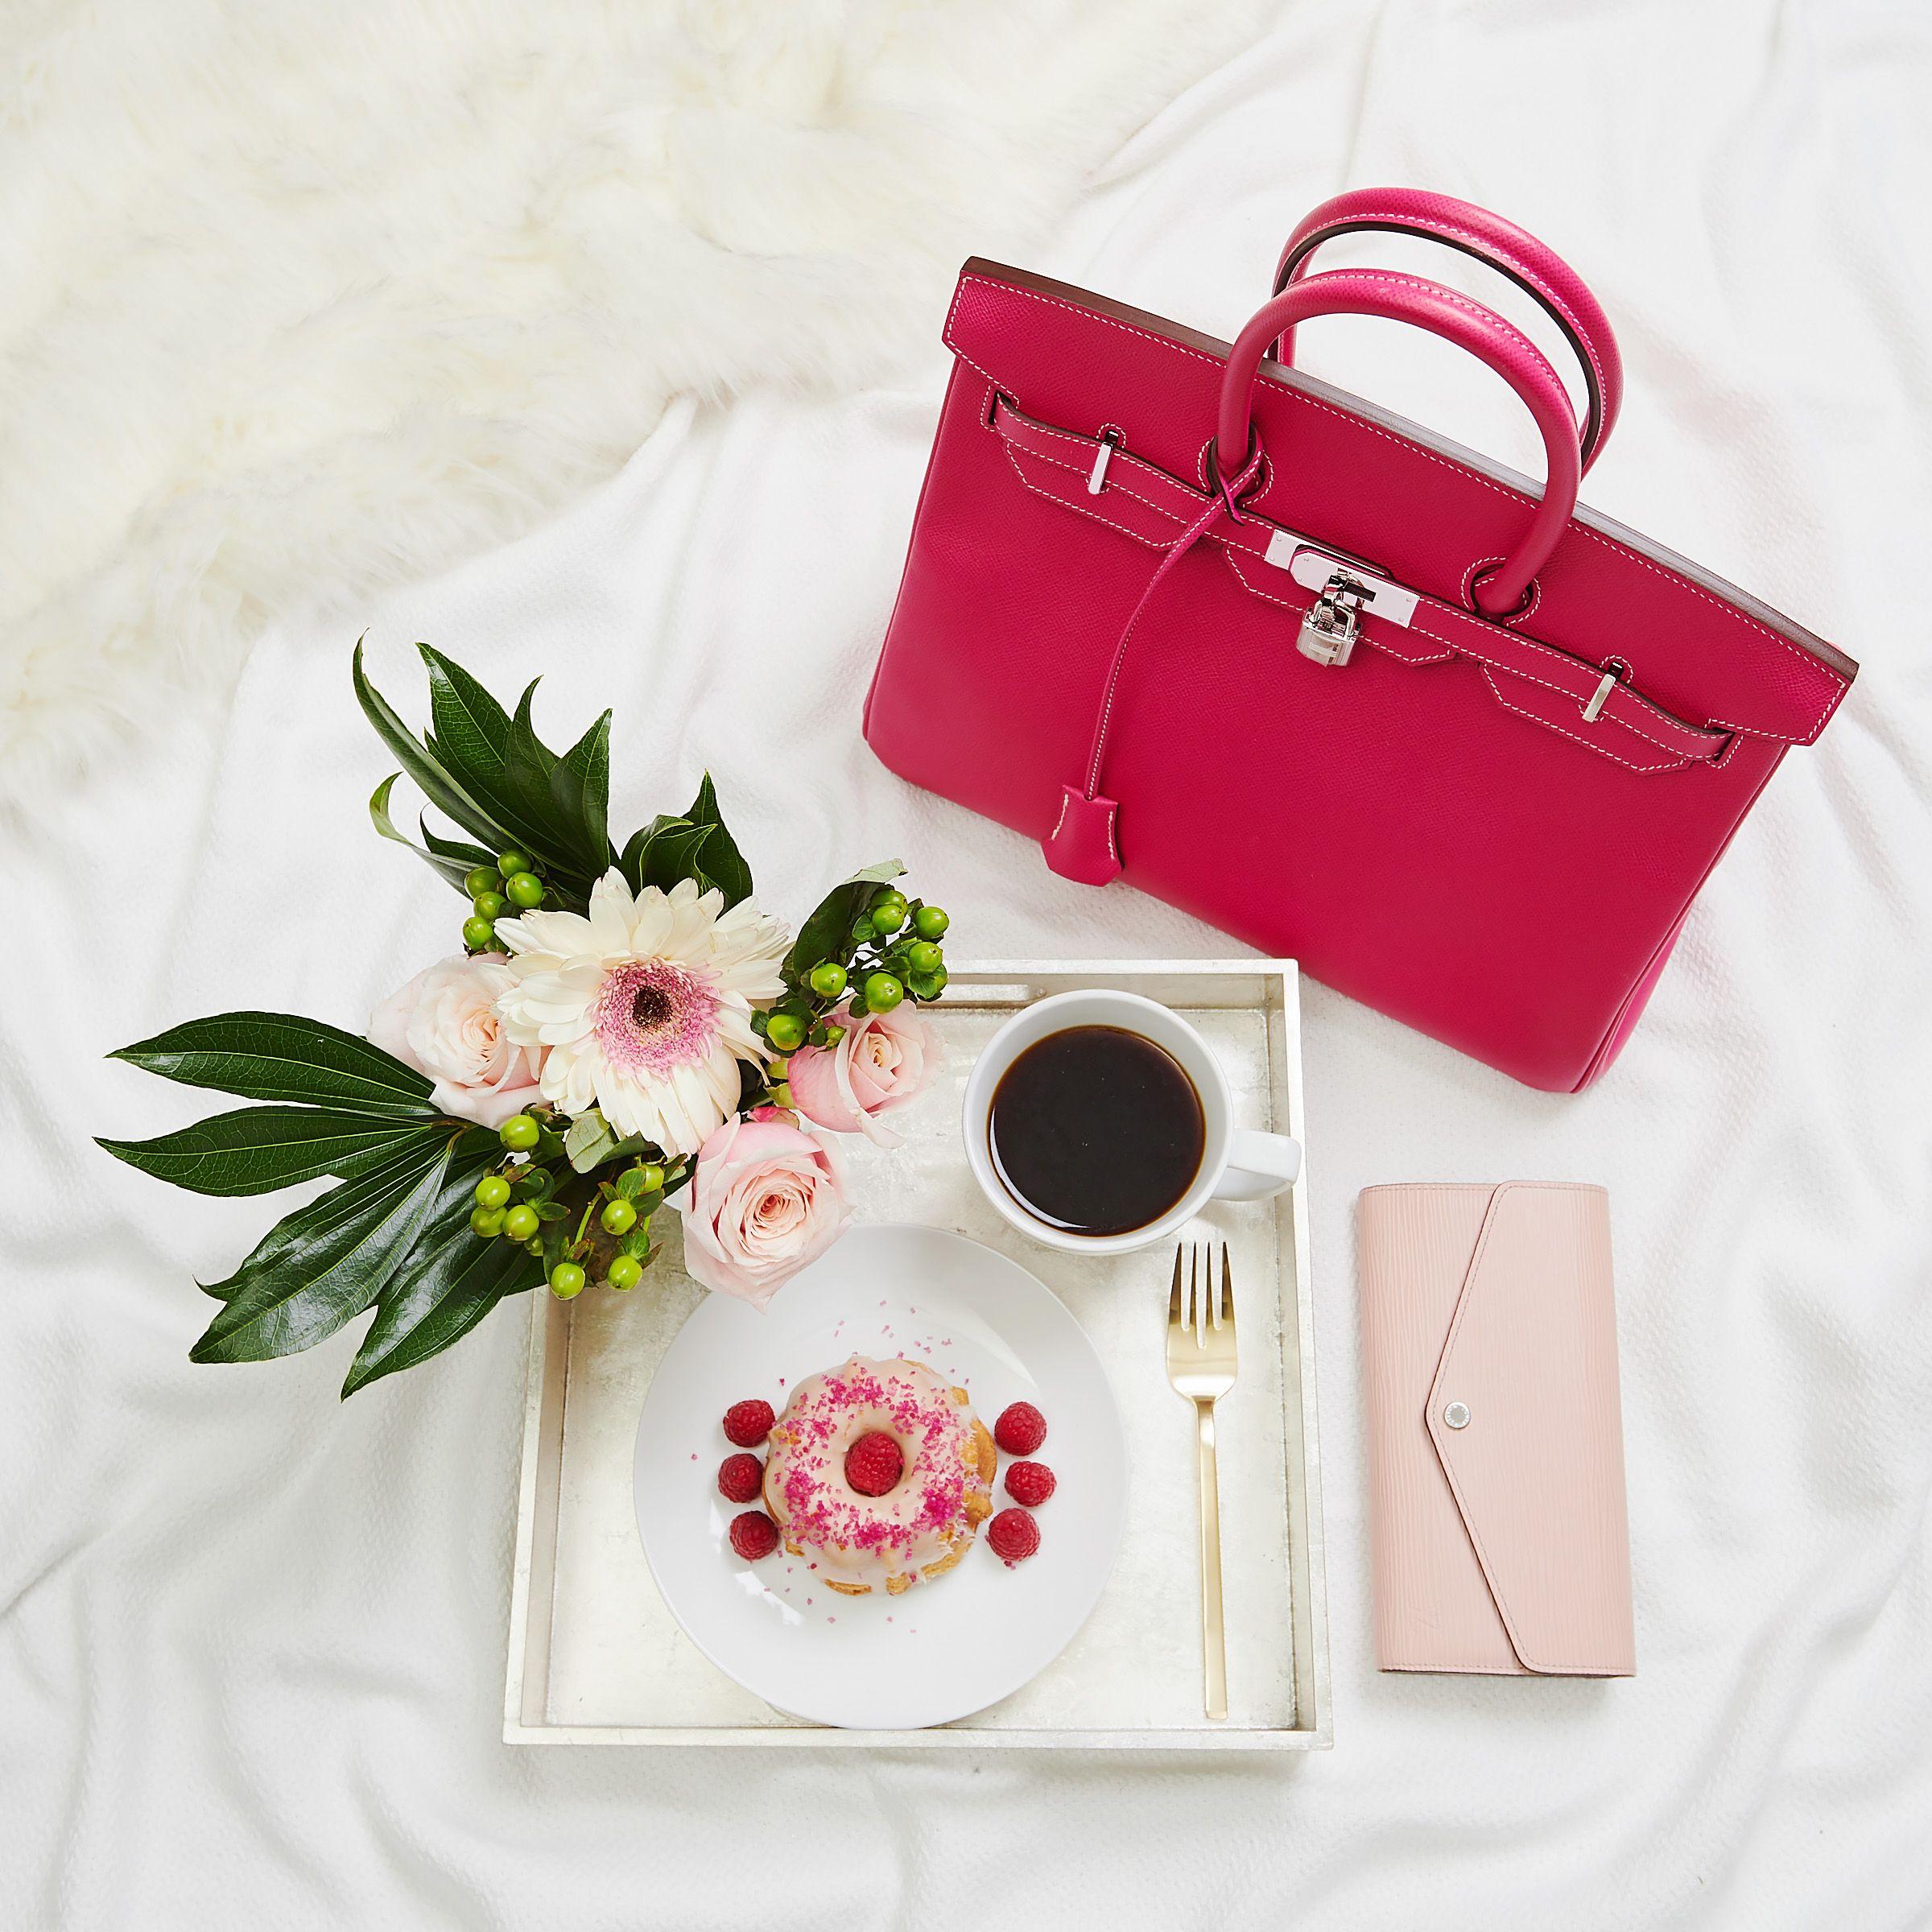 Hermes 35cm Rose Tyrien Epsom Leather Palladium Plated Birkin Bag